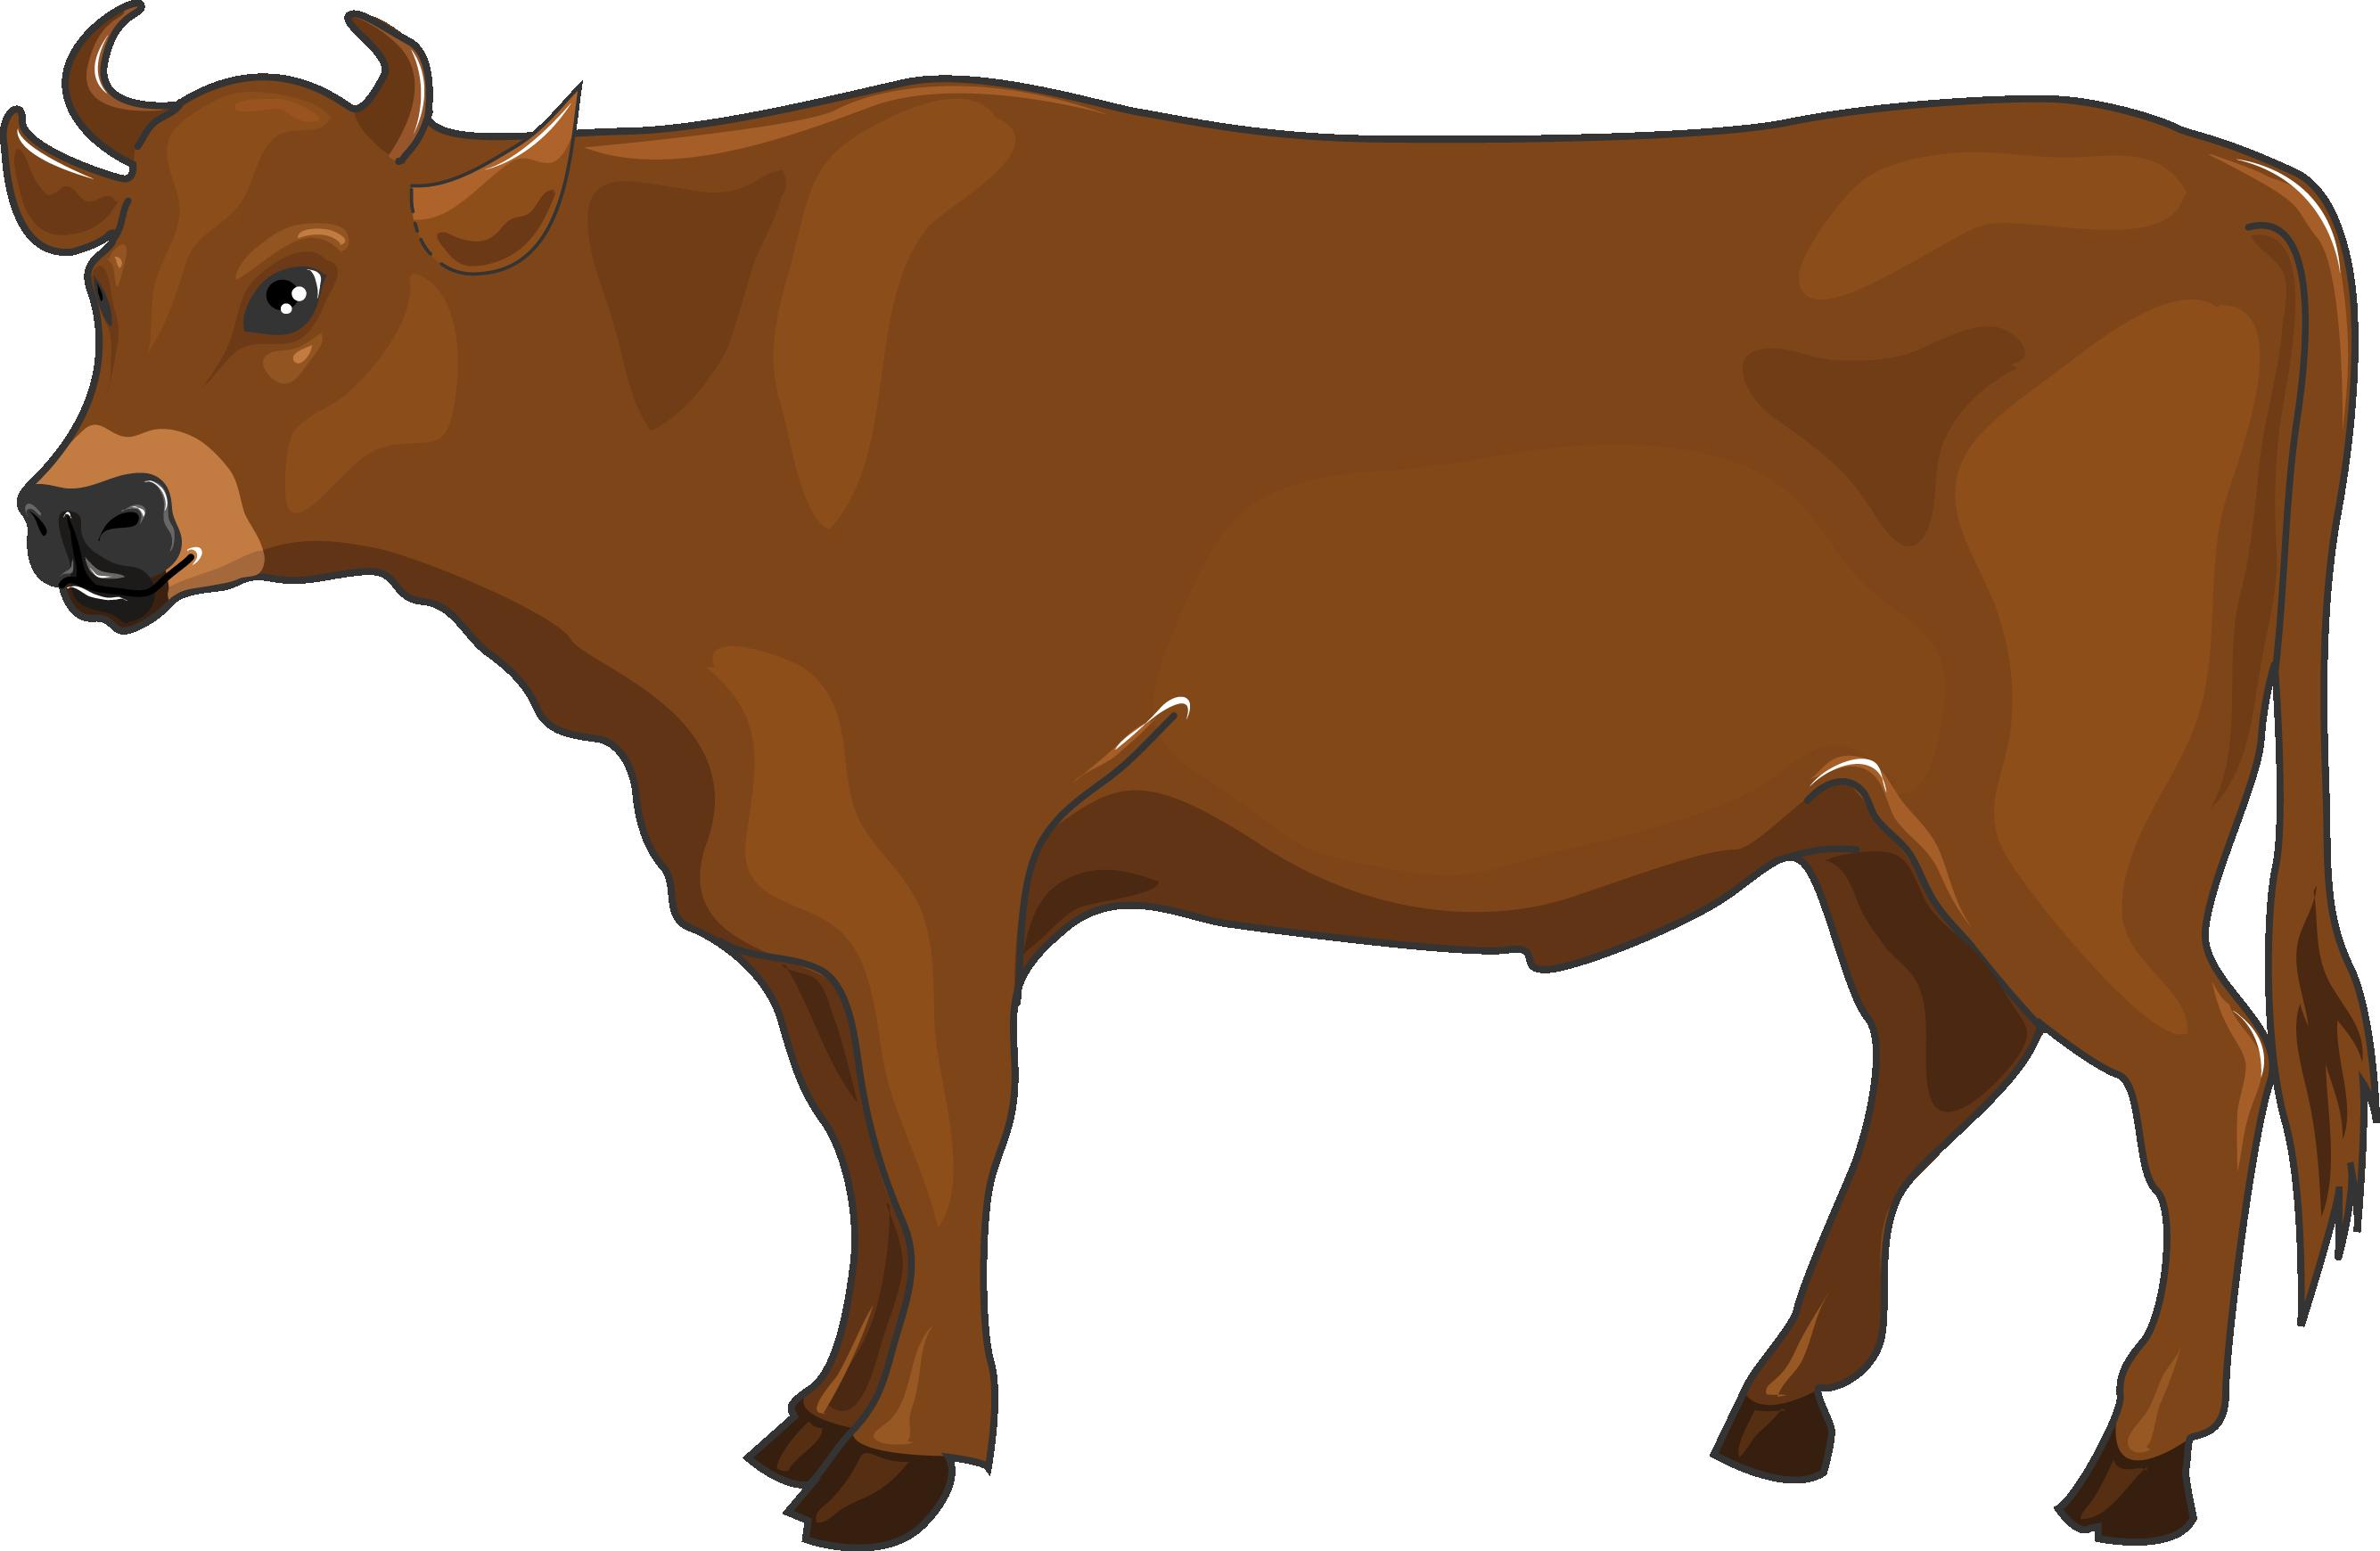 Ox clipart propensity. Beef servier medical art